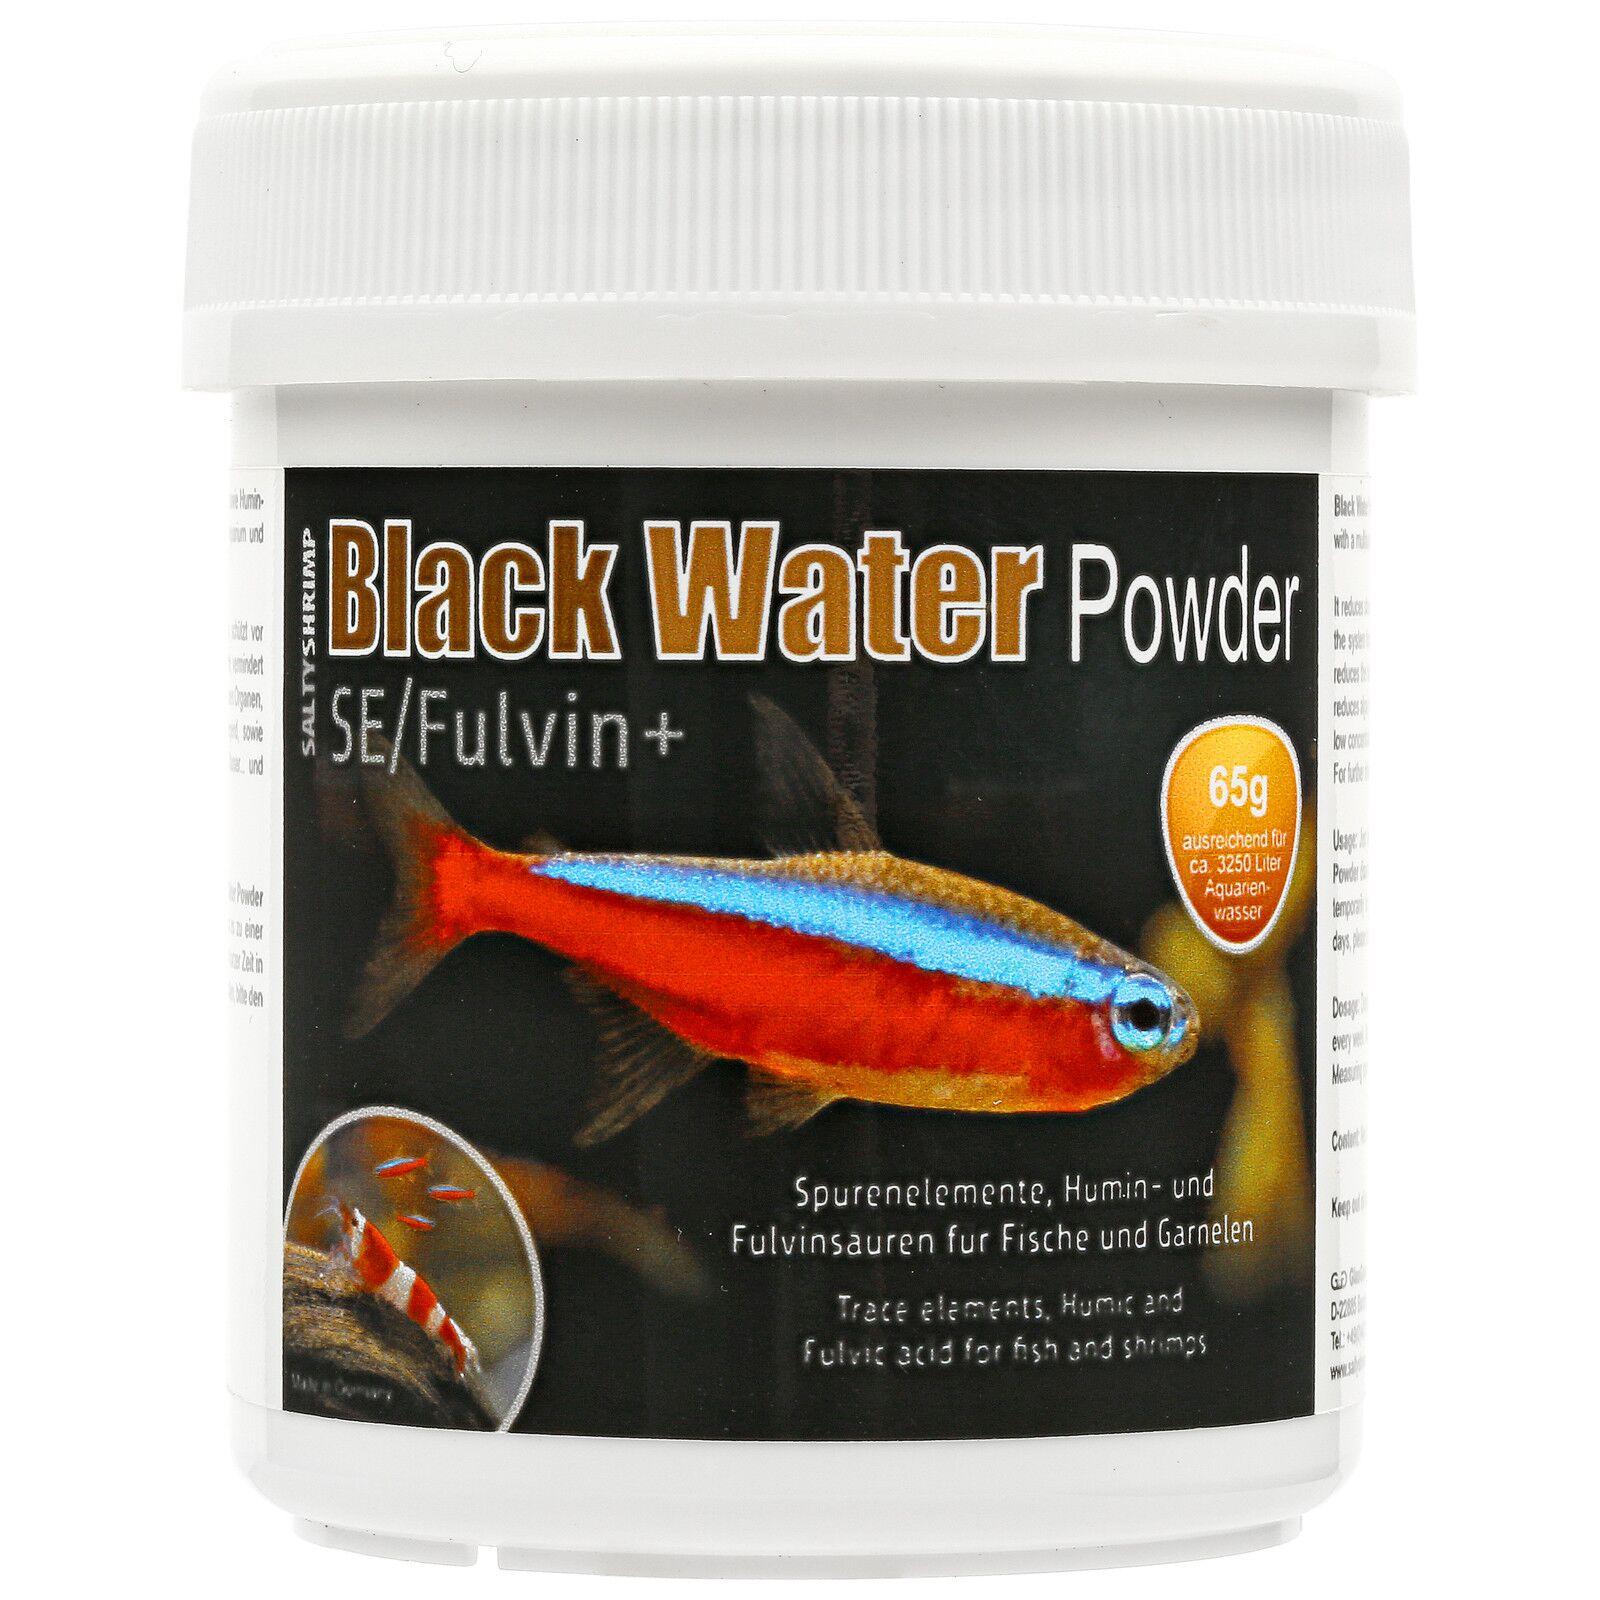 Saltyshrimp Black Water Powder Se Fulvin Aquasabi Aquascaping